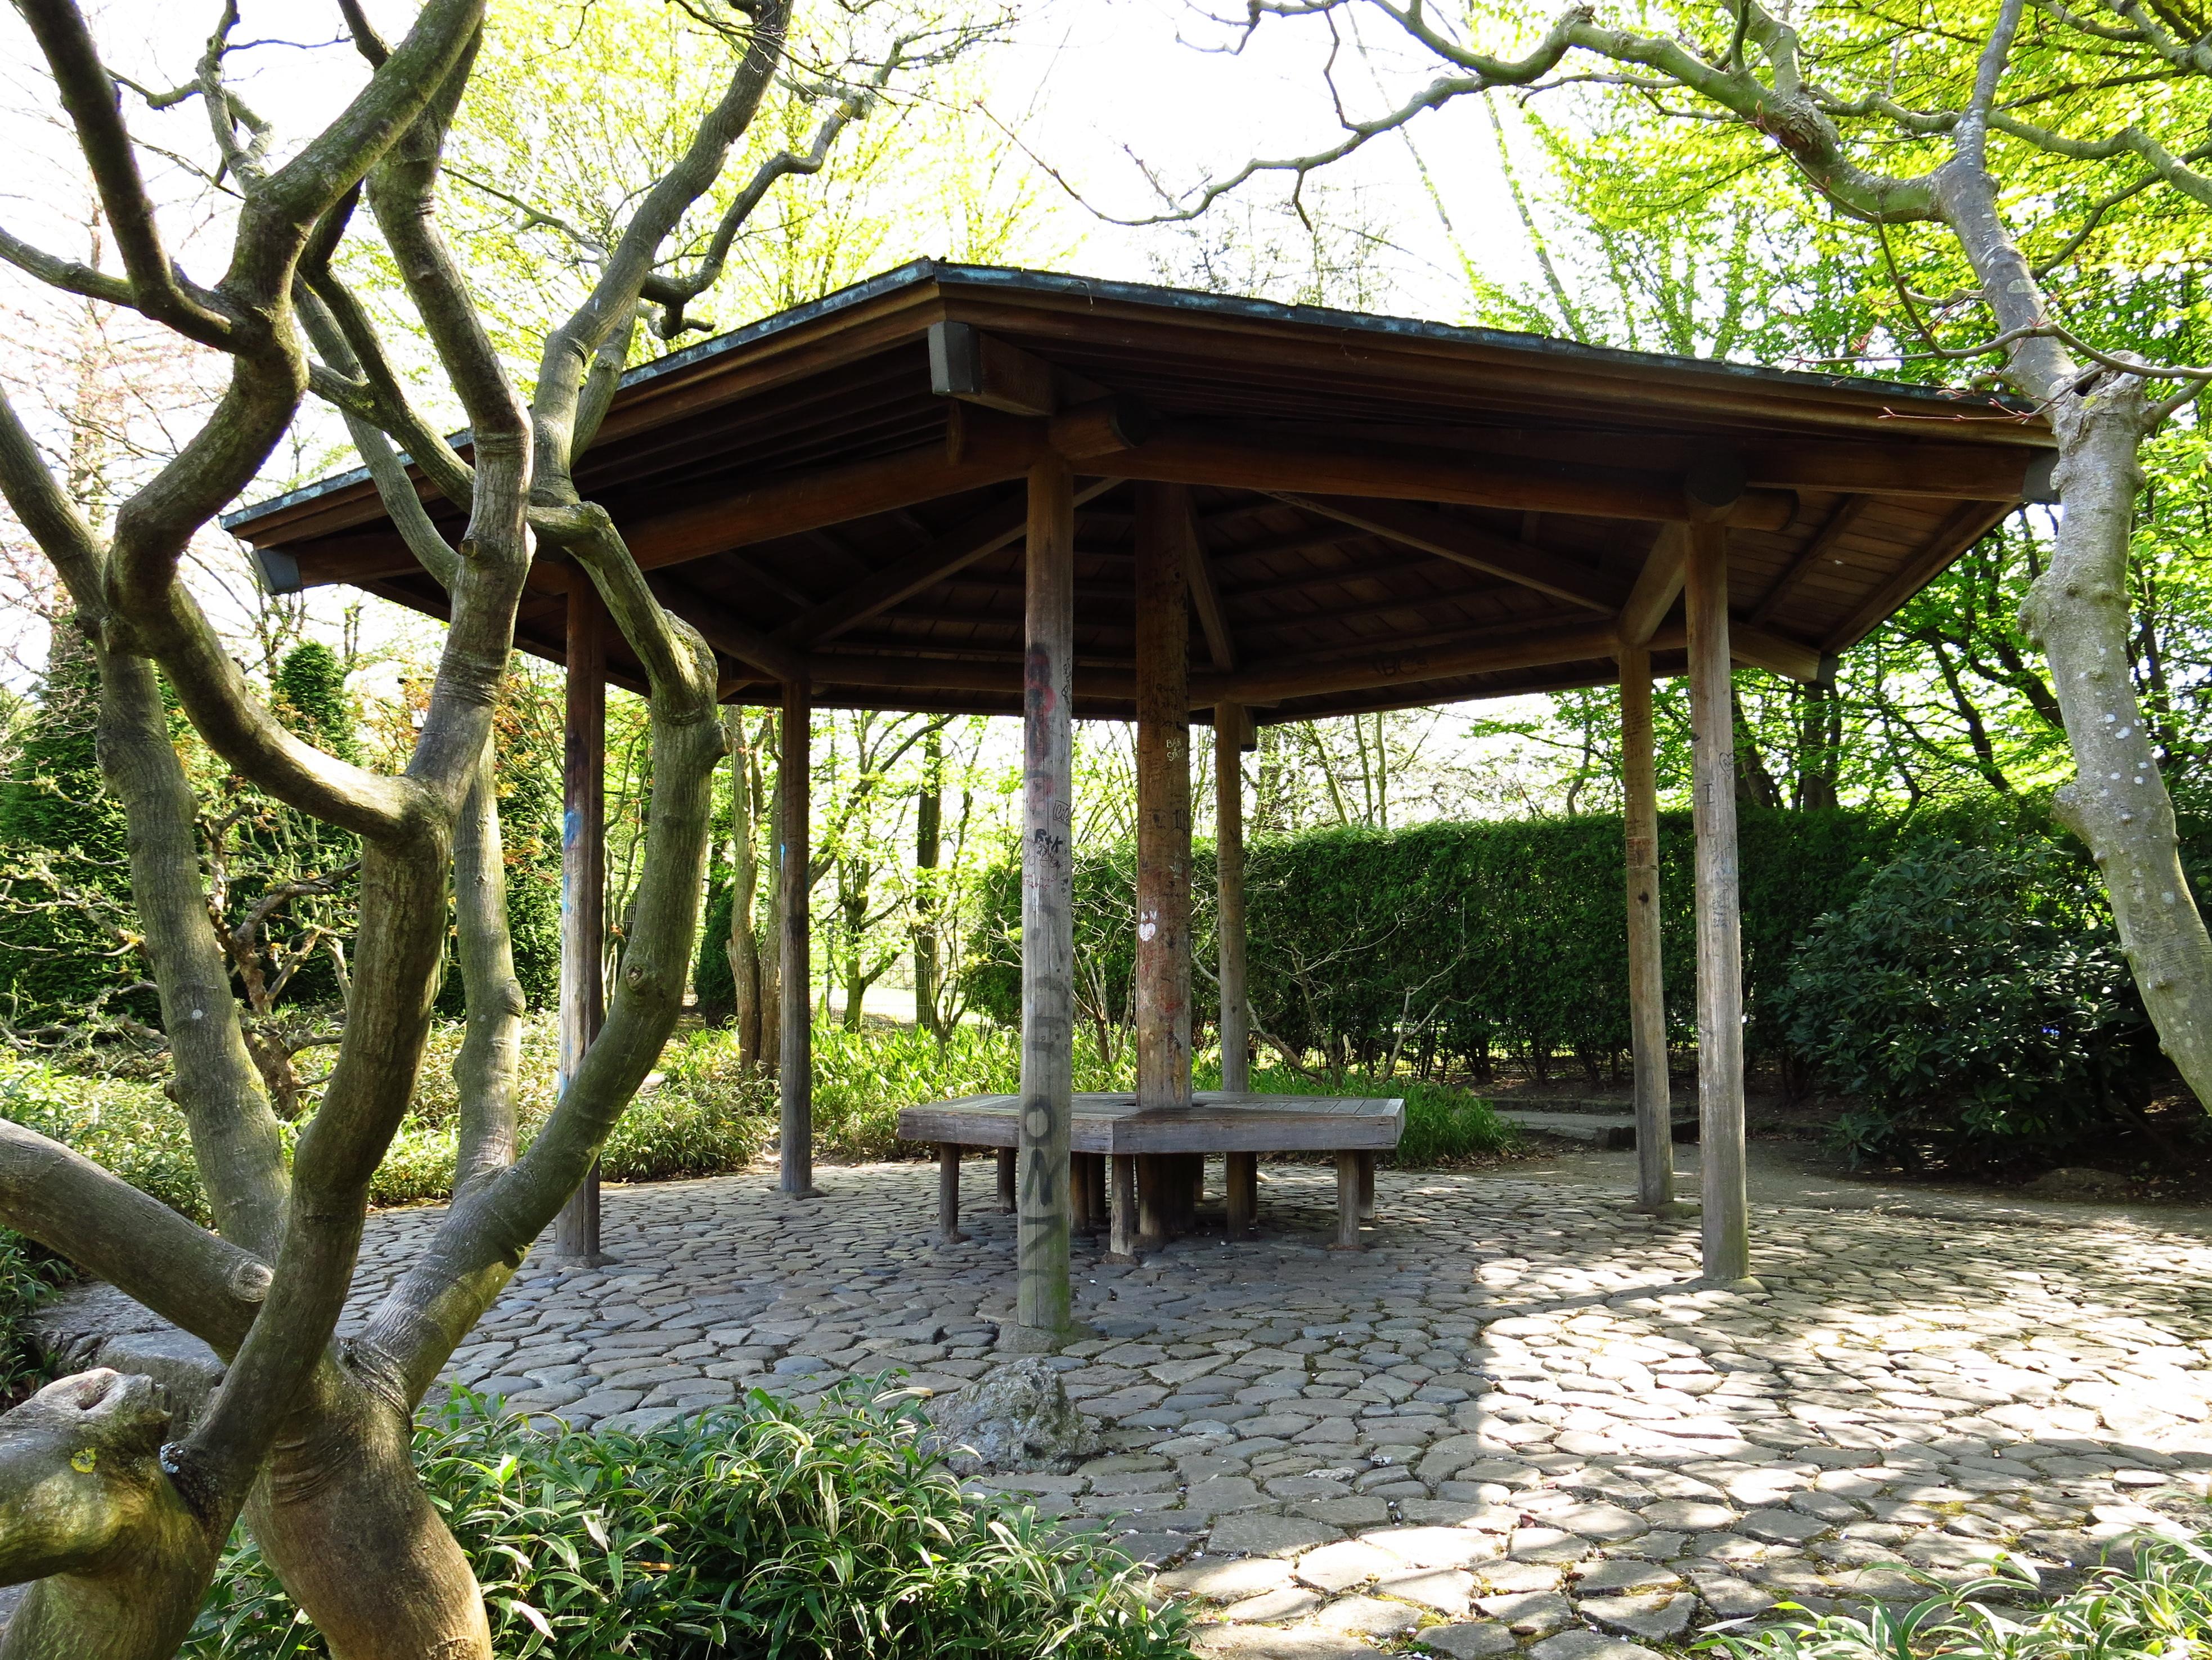 File:Japanischer Garten Teehaus 01